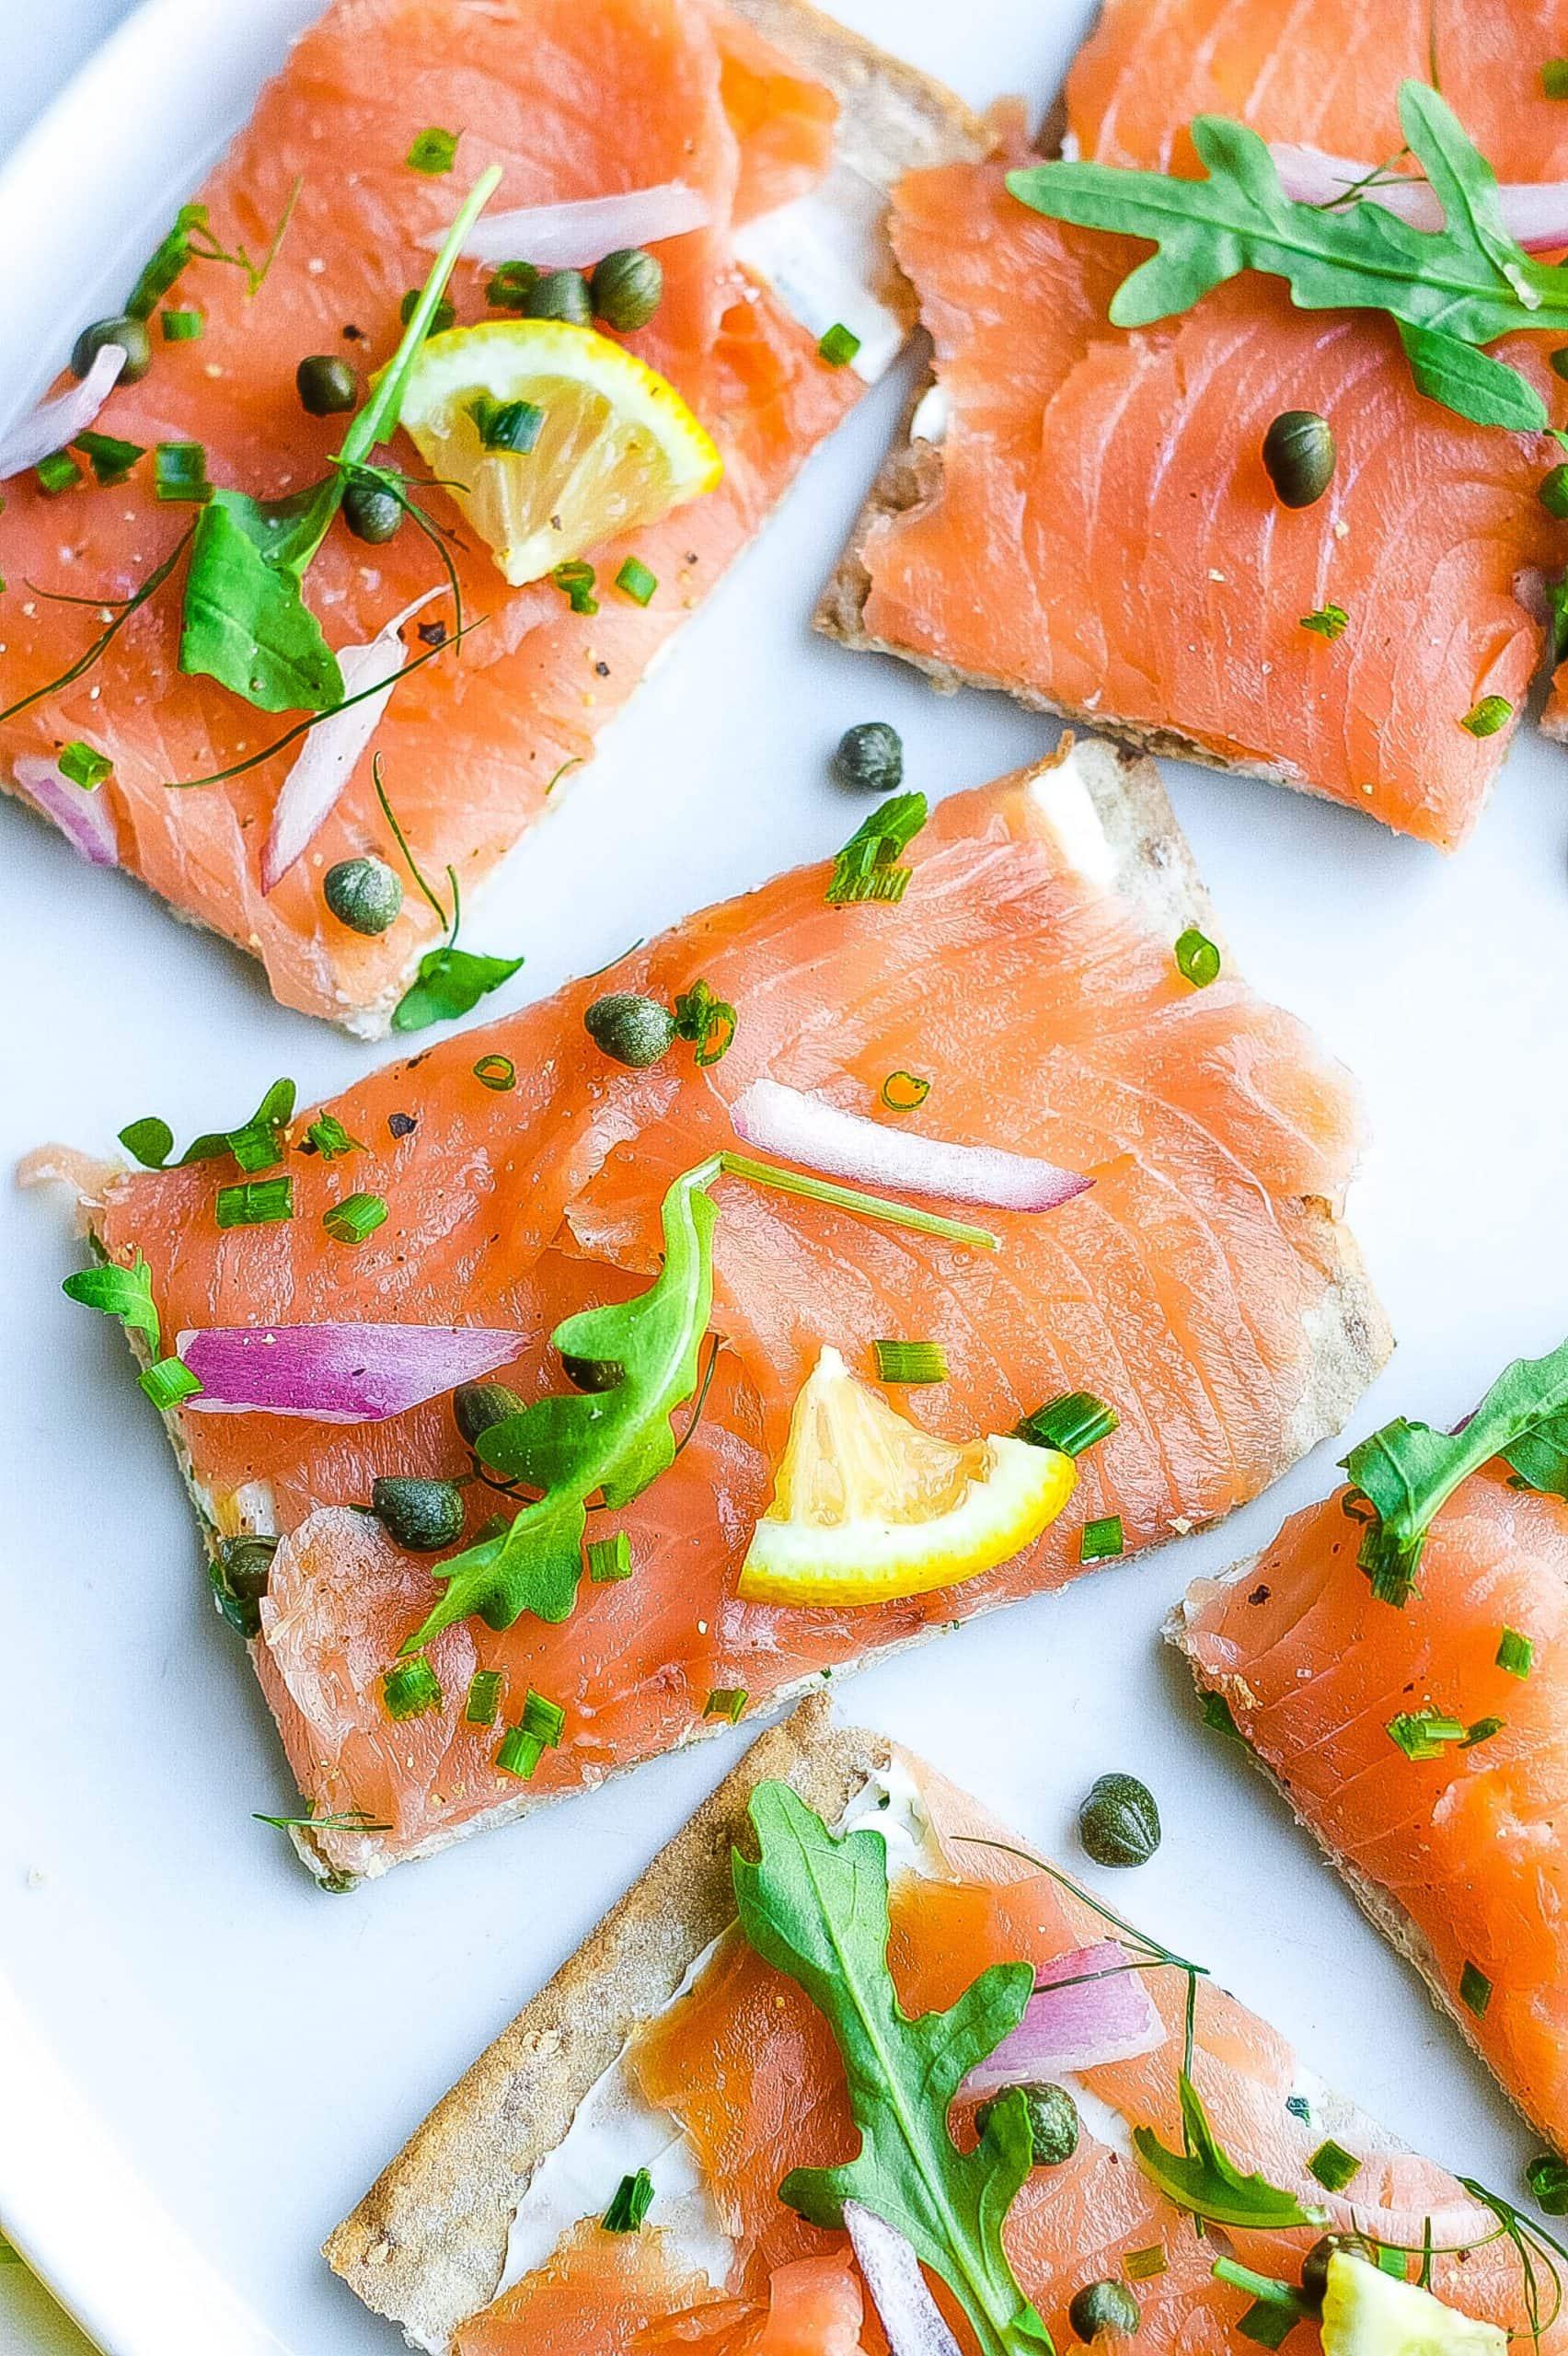 15 Minute Smoked Salmon Flatbread